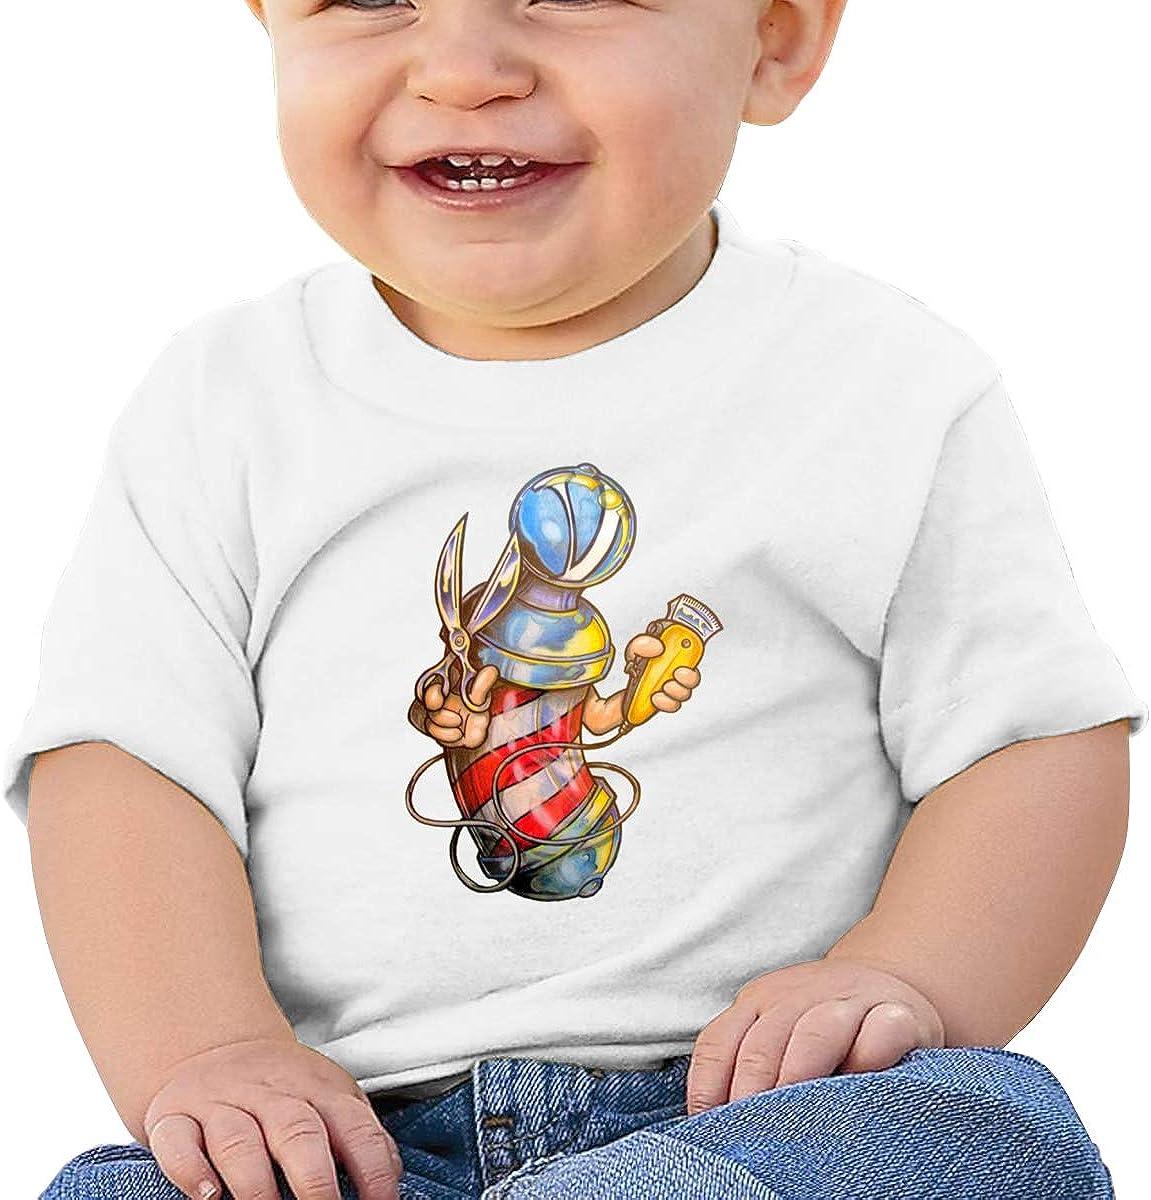 Negi Funny Barber Cotton Infant Girls Shirts Short Sleeve